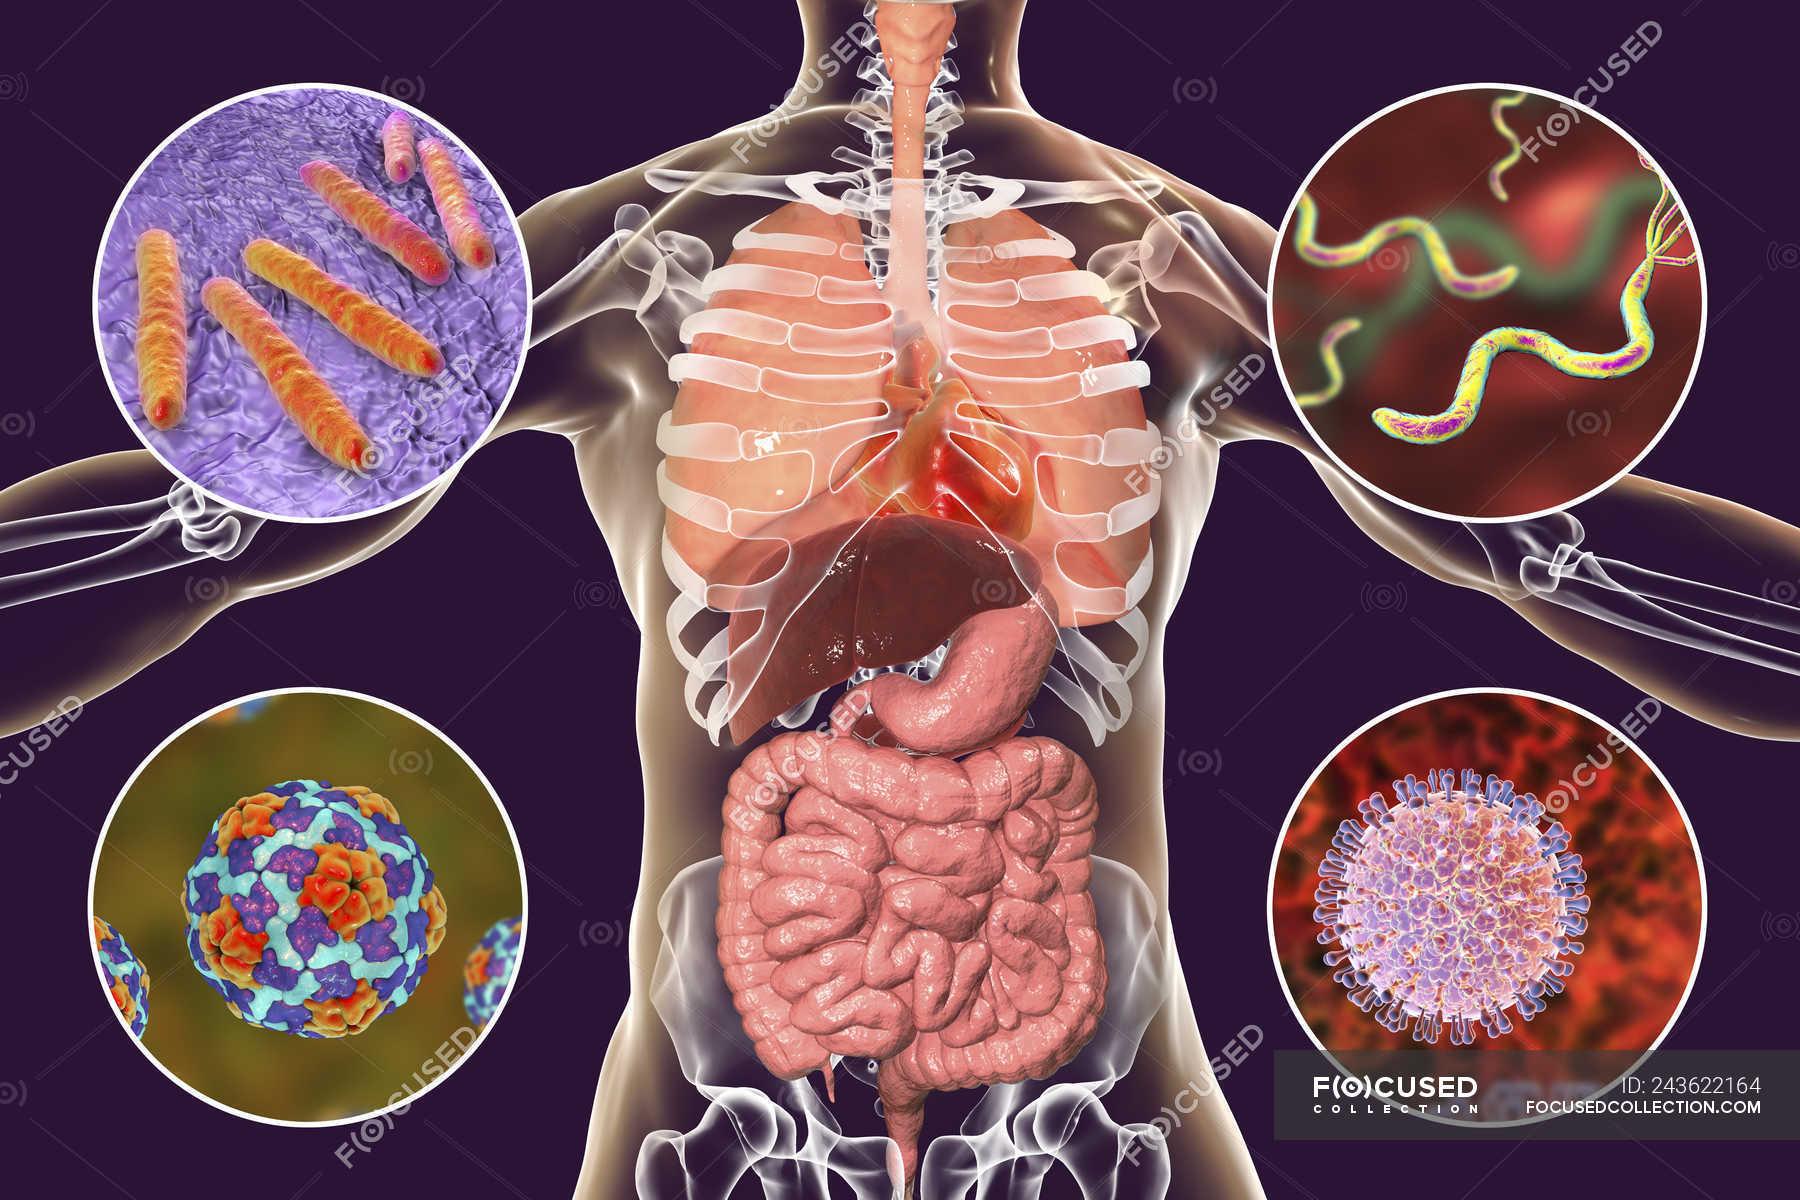 Laryngeal Tuberculosis Mimicking Supraglottic Carcinoma: A